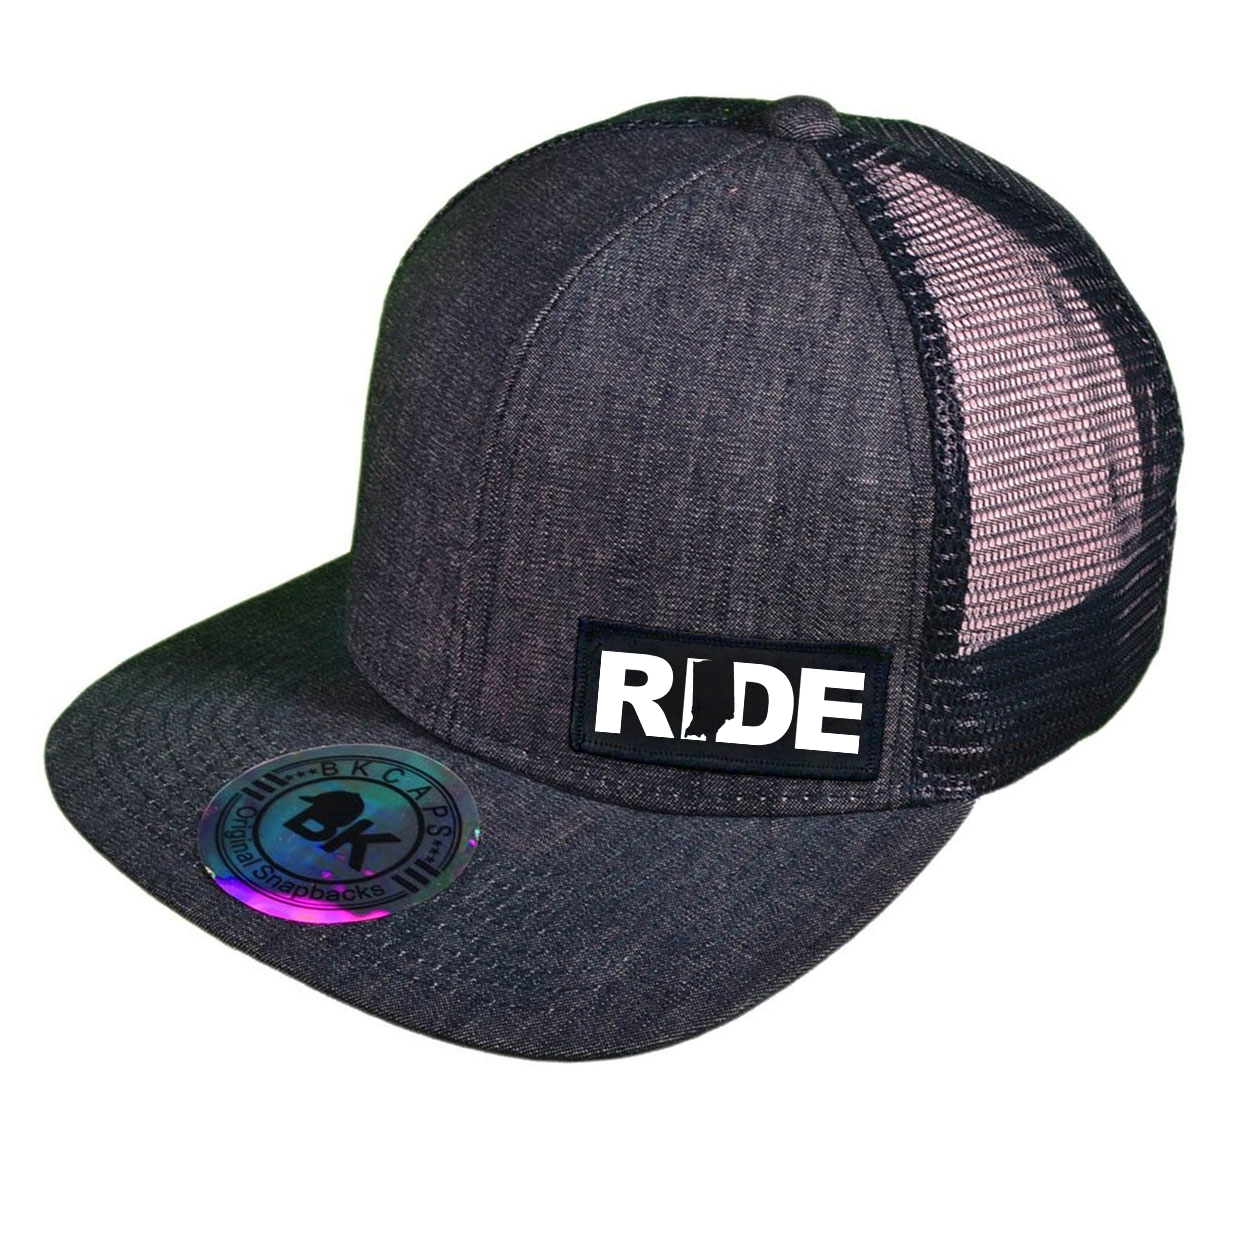 Ride Indiana Night Out Woven Patch Snapback Flat Brim Hat Dark Navy Denim (White Logo)